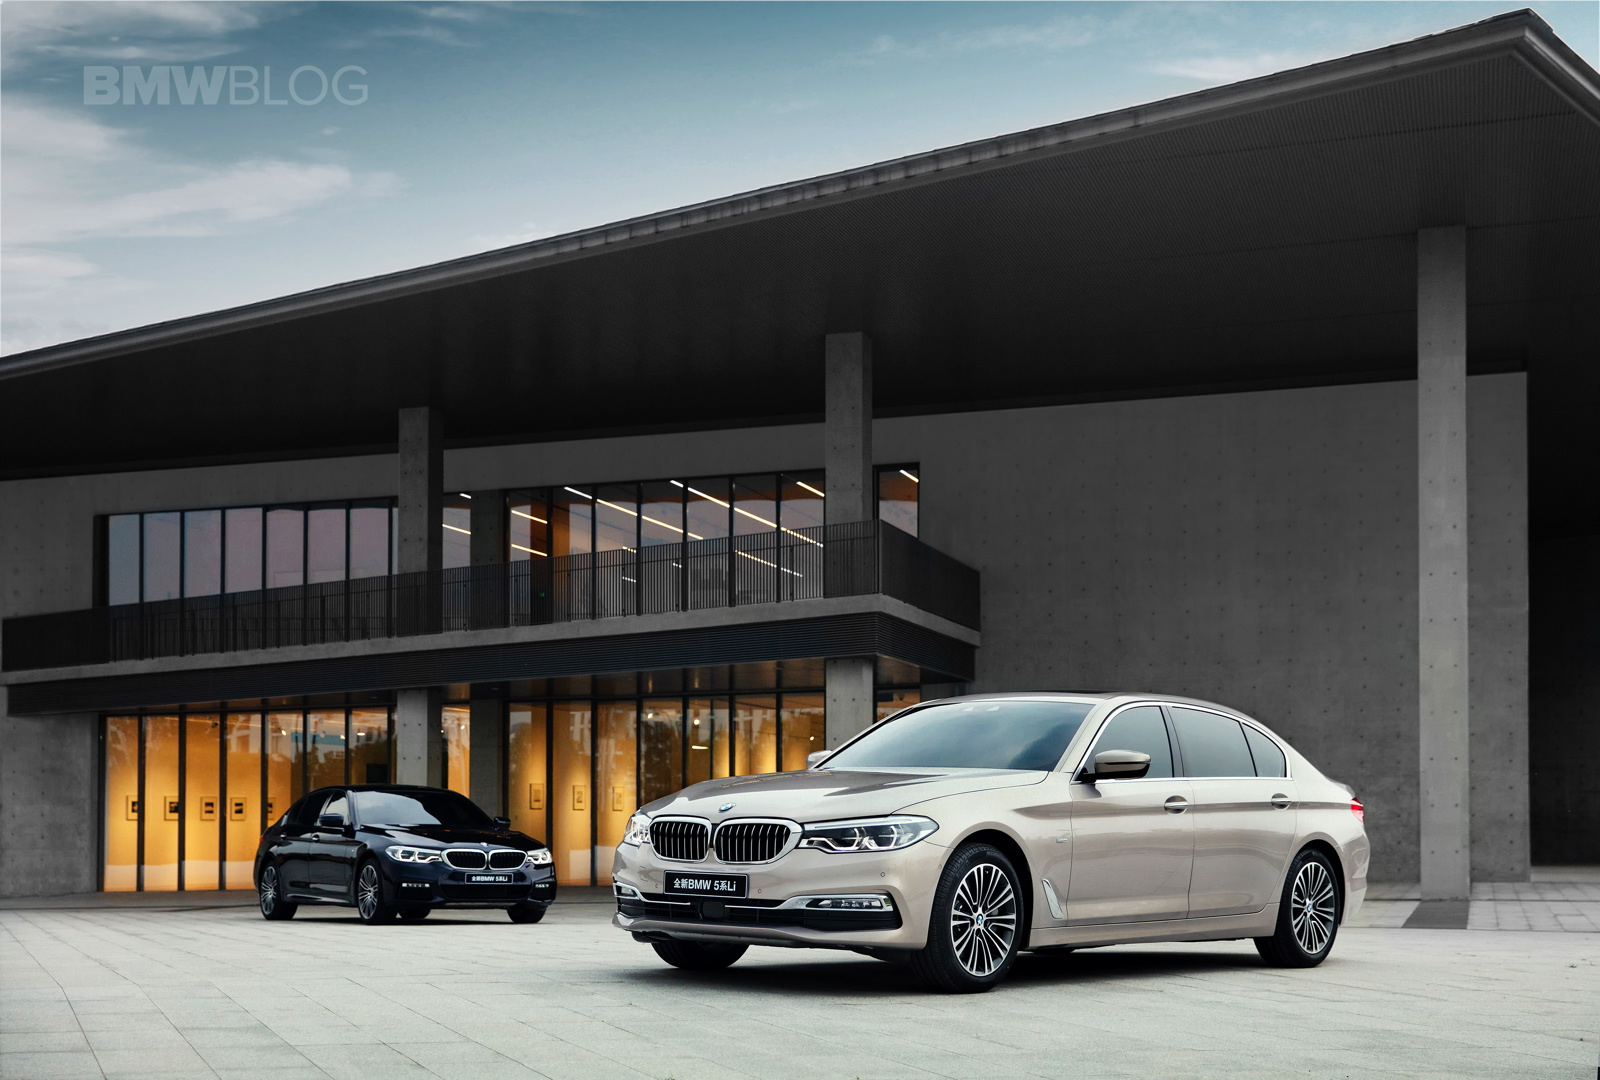 2017 BMW 5 Series Li 01